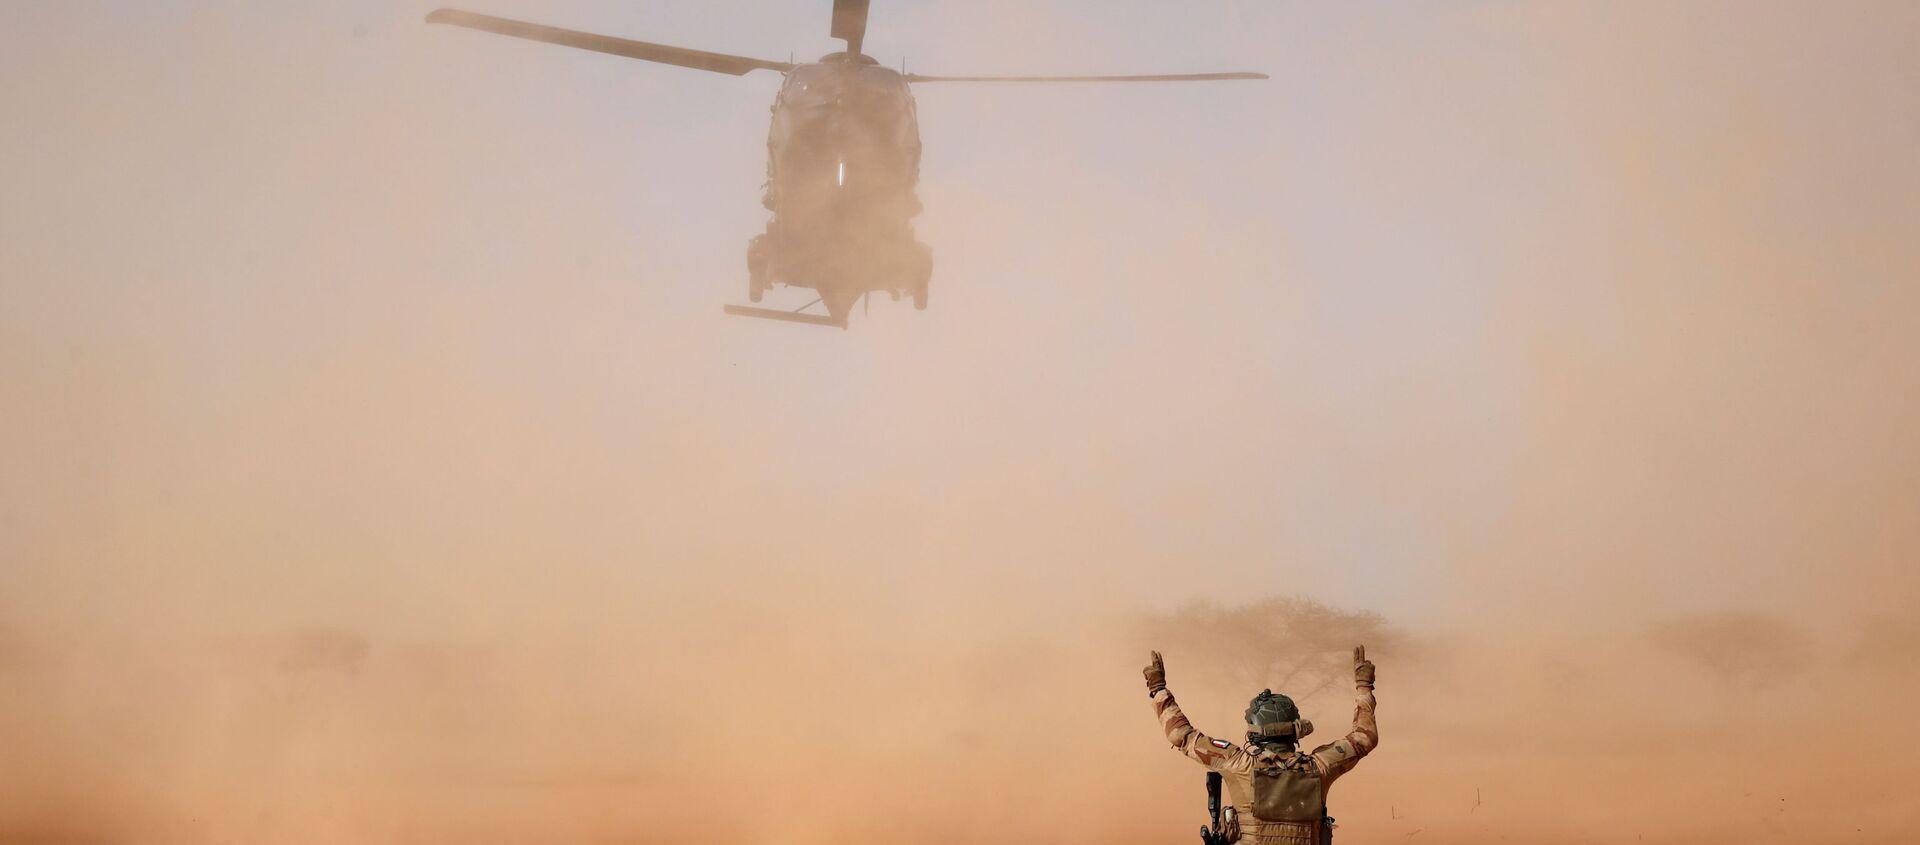 Un NH90 Caiman atterra durante l'Operazione Barkhane a Ndaki in Mali - Sputnik Italia, 1920, 26.11.2019